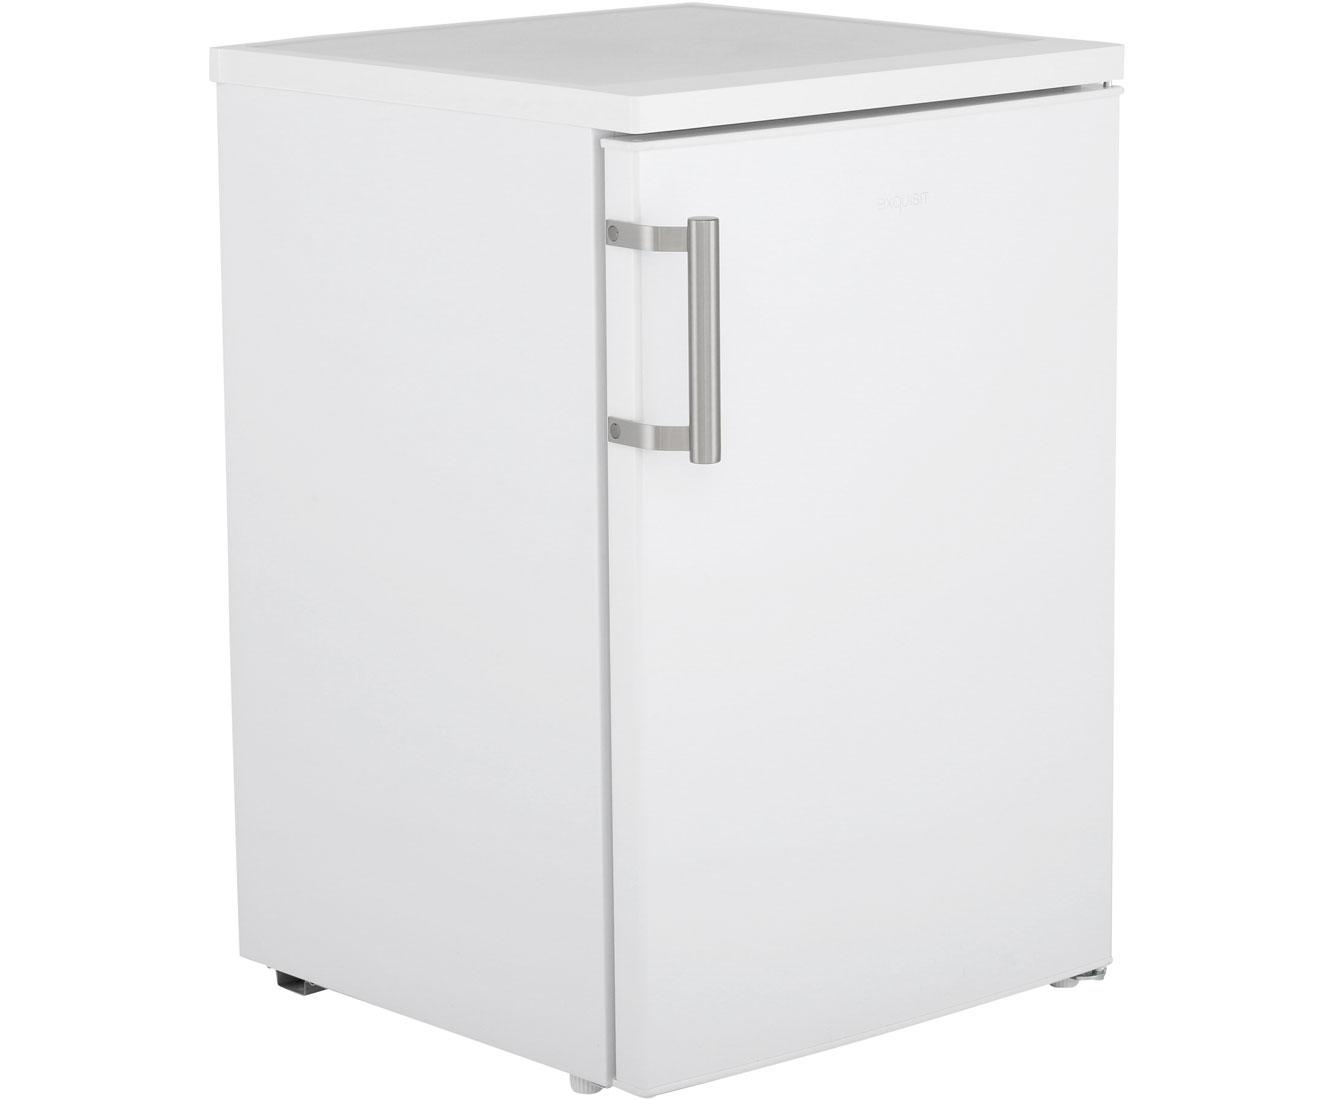 Exquisit KS 16-1 RVA+++ Kühlschrank - Weiß, A+++